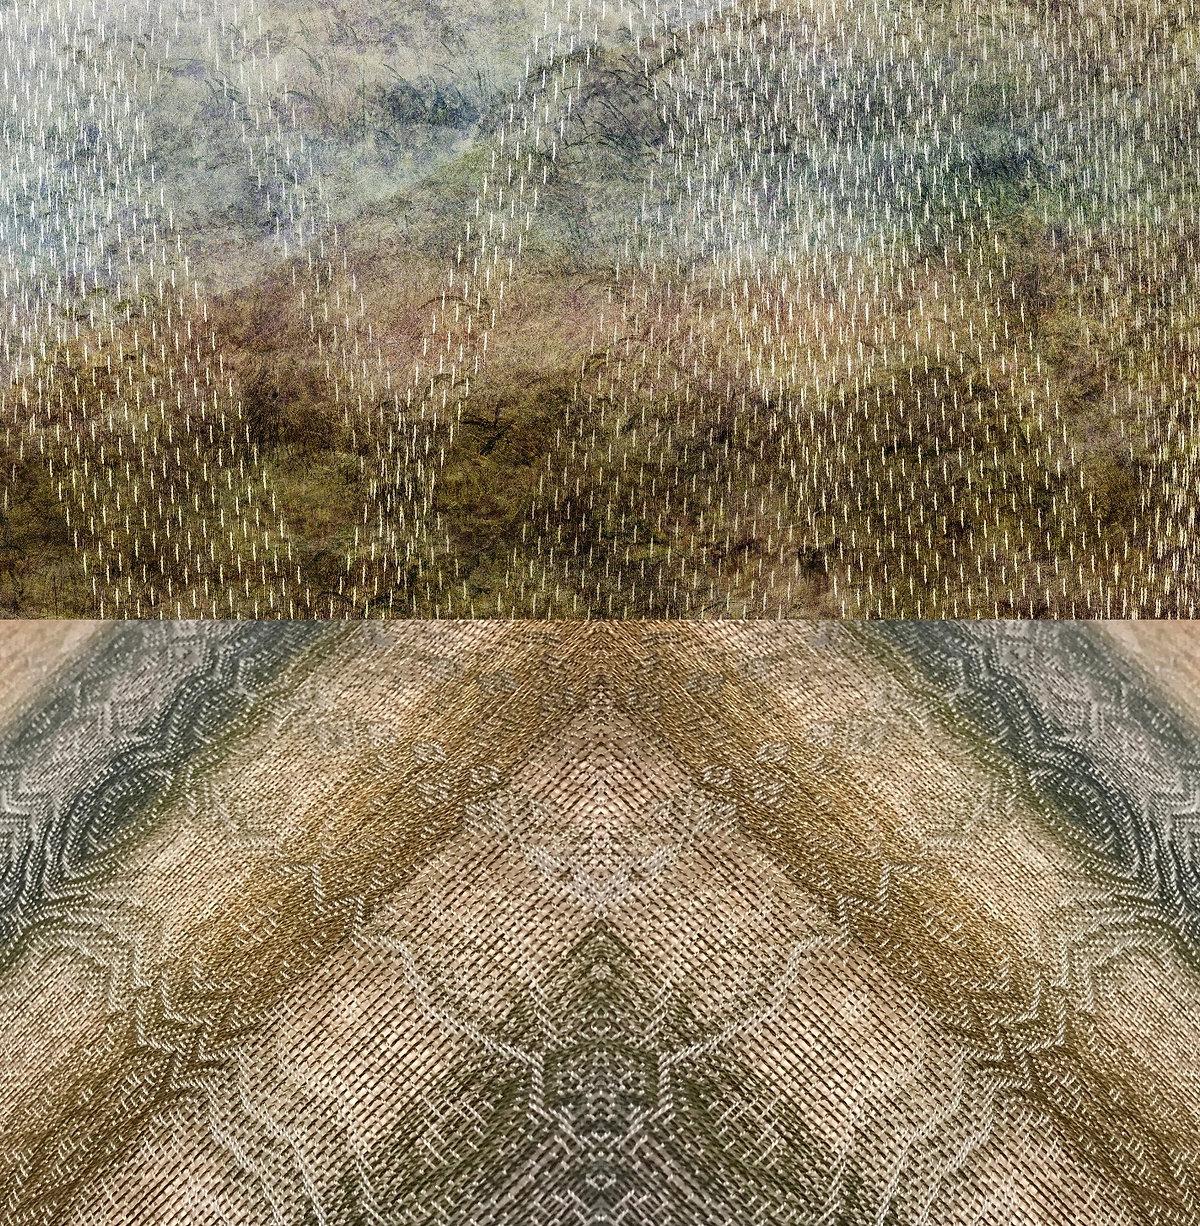 SANCTUARIES; A Print and Sound Installation by Kristine Barrett with Woven Textiles by Debbie Barrett-Jones